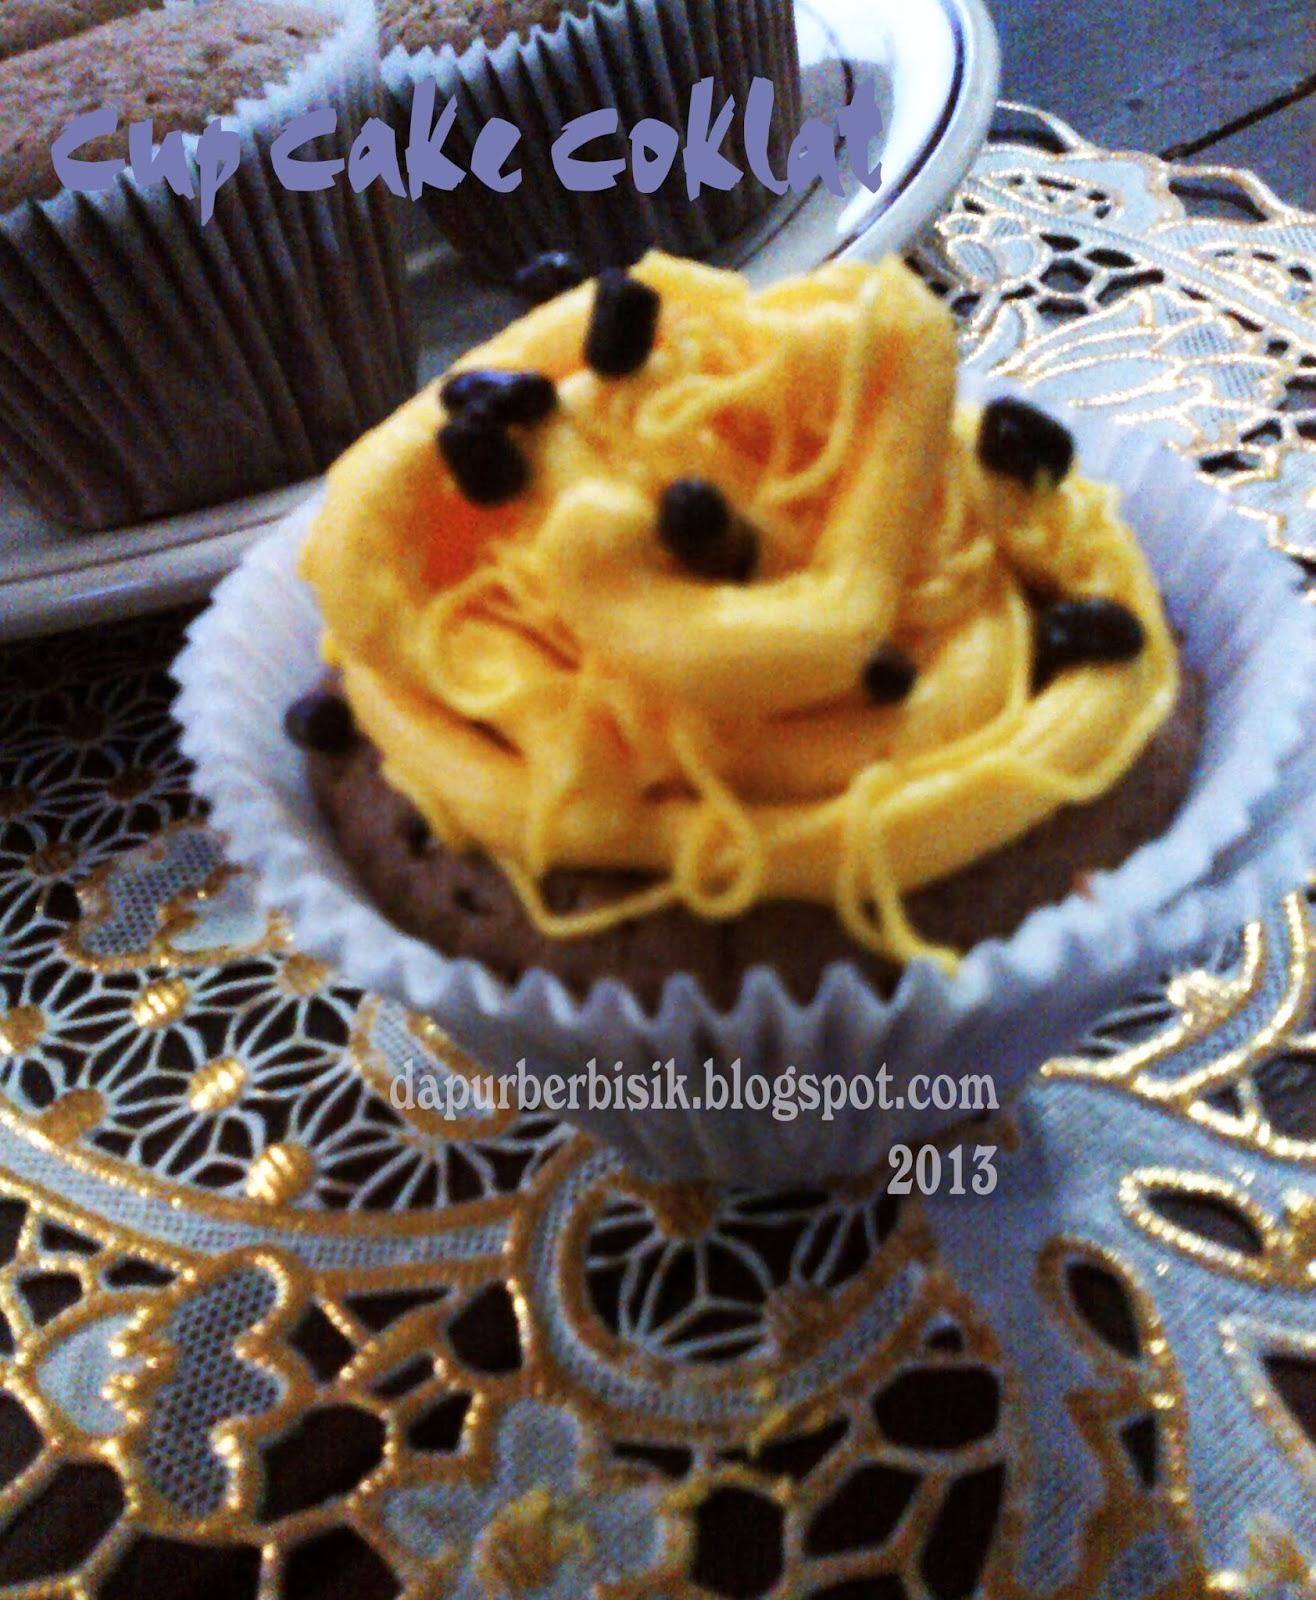 Resep Cup Cake Coklat Resep Cup Sponge Cake Coklat